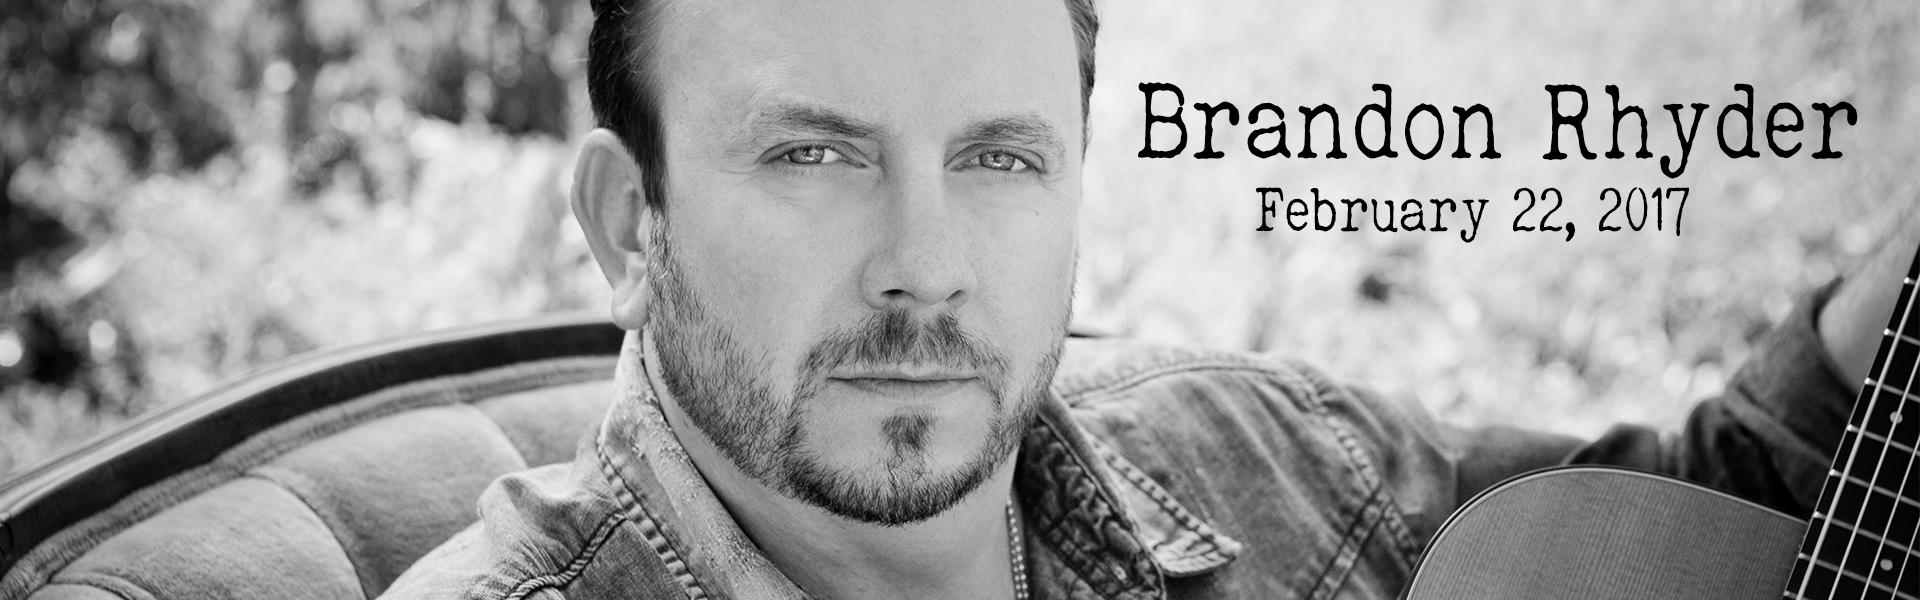 Brandon-Rhyder-Banner-1